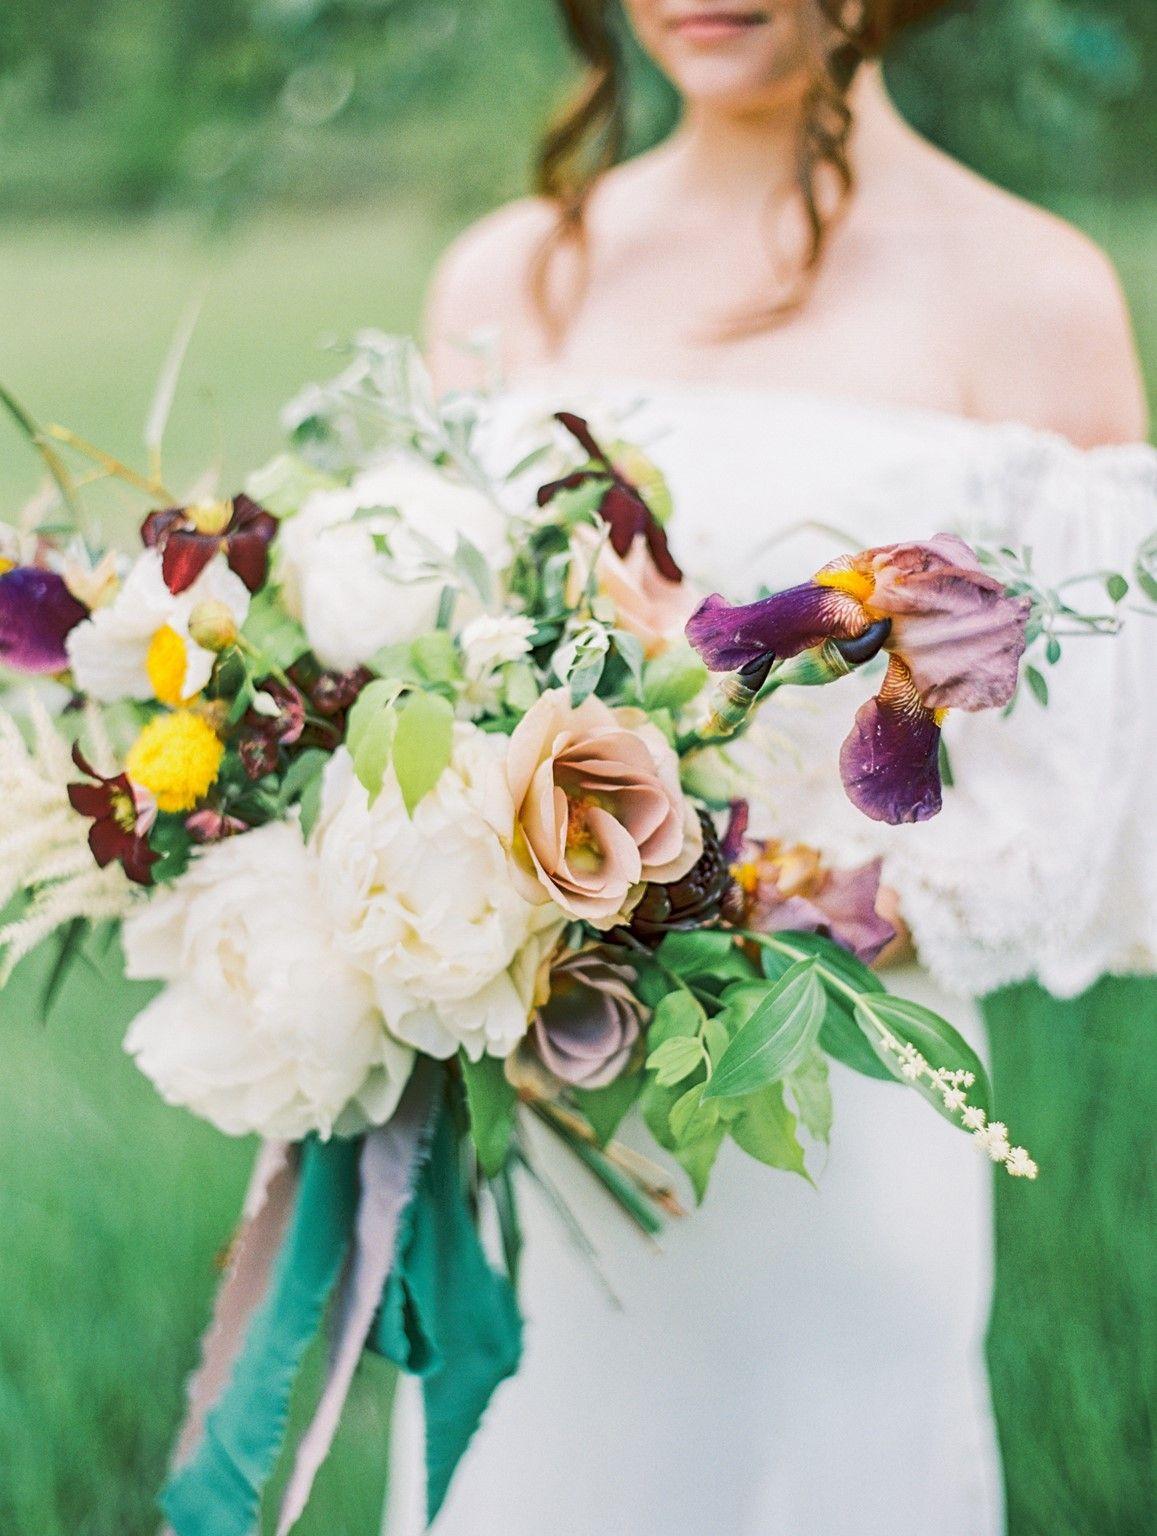 The Bloemist on Bouquet, Wedding